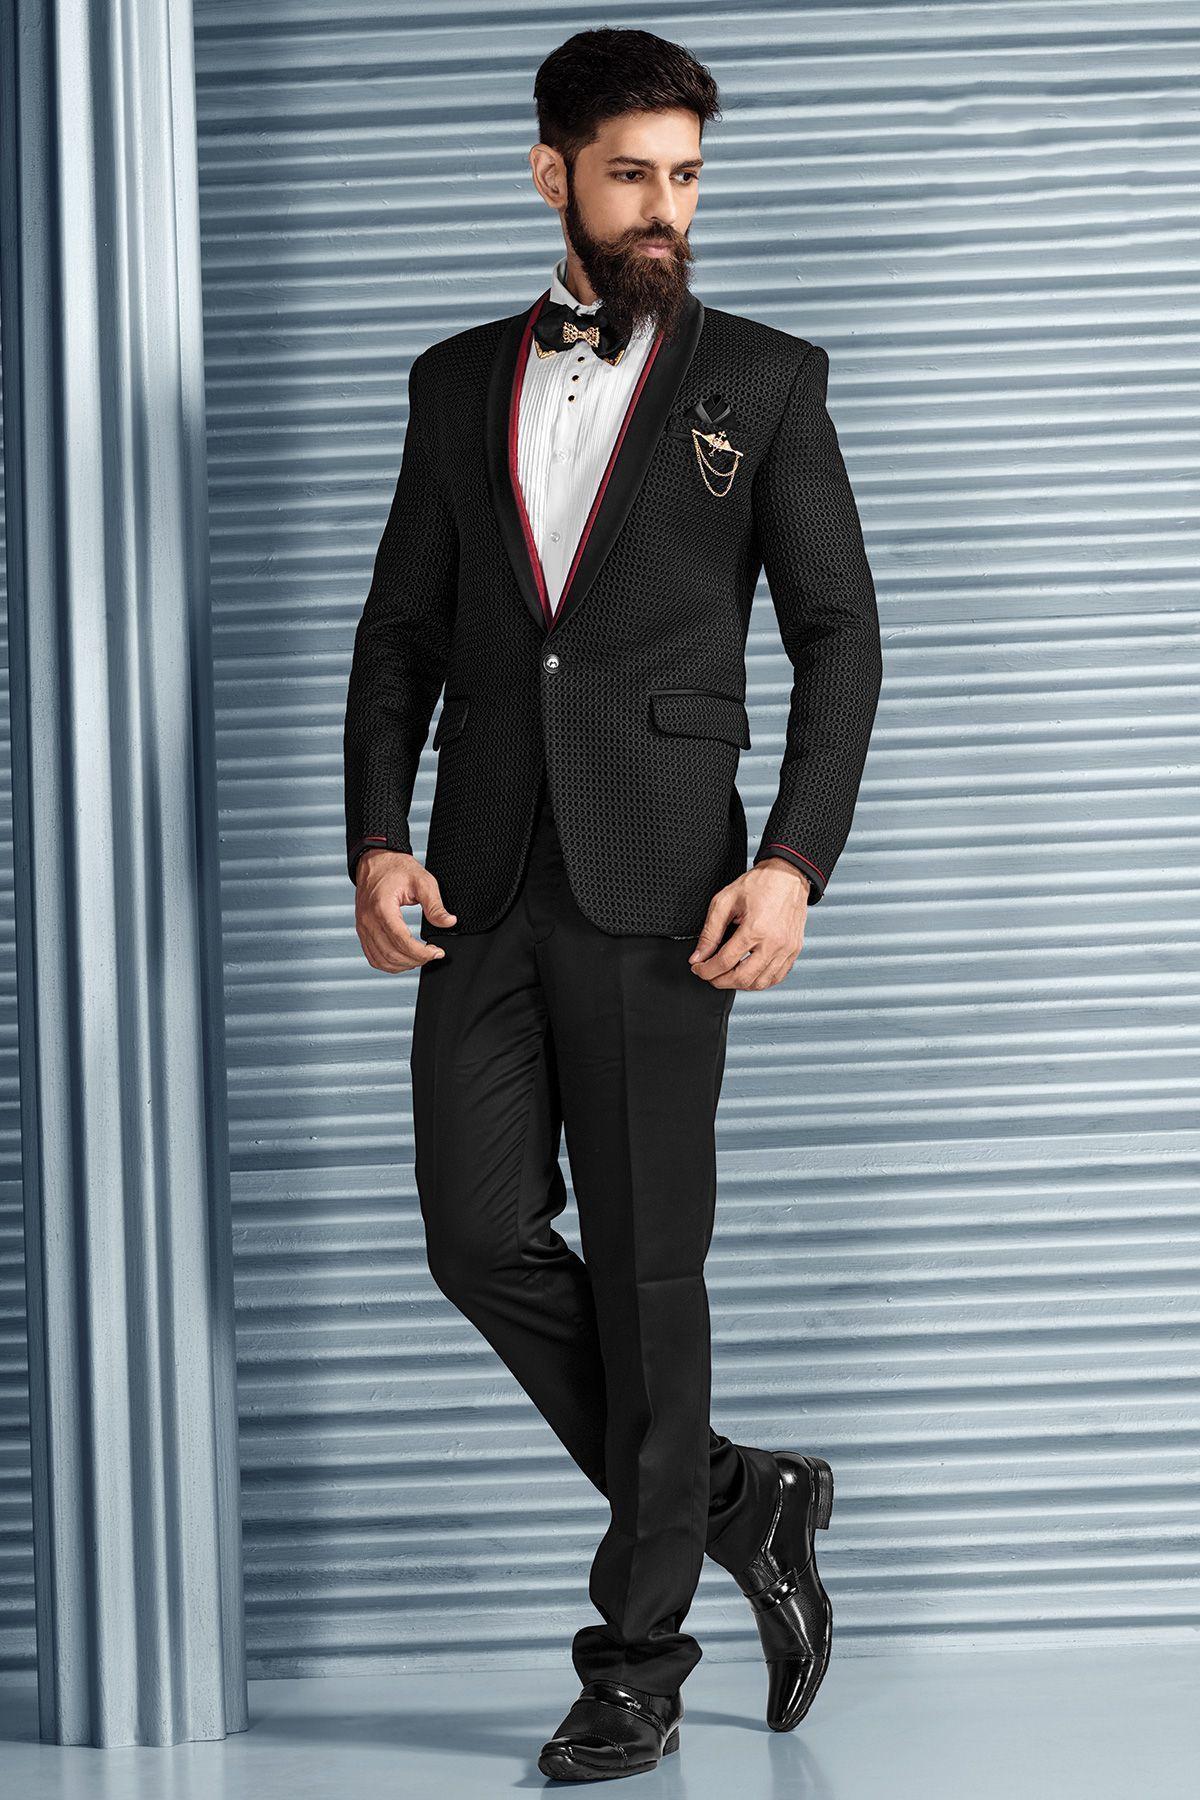 Generous Guys Prom Tuxedos Images - Wedding Ideas - memiocall.com